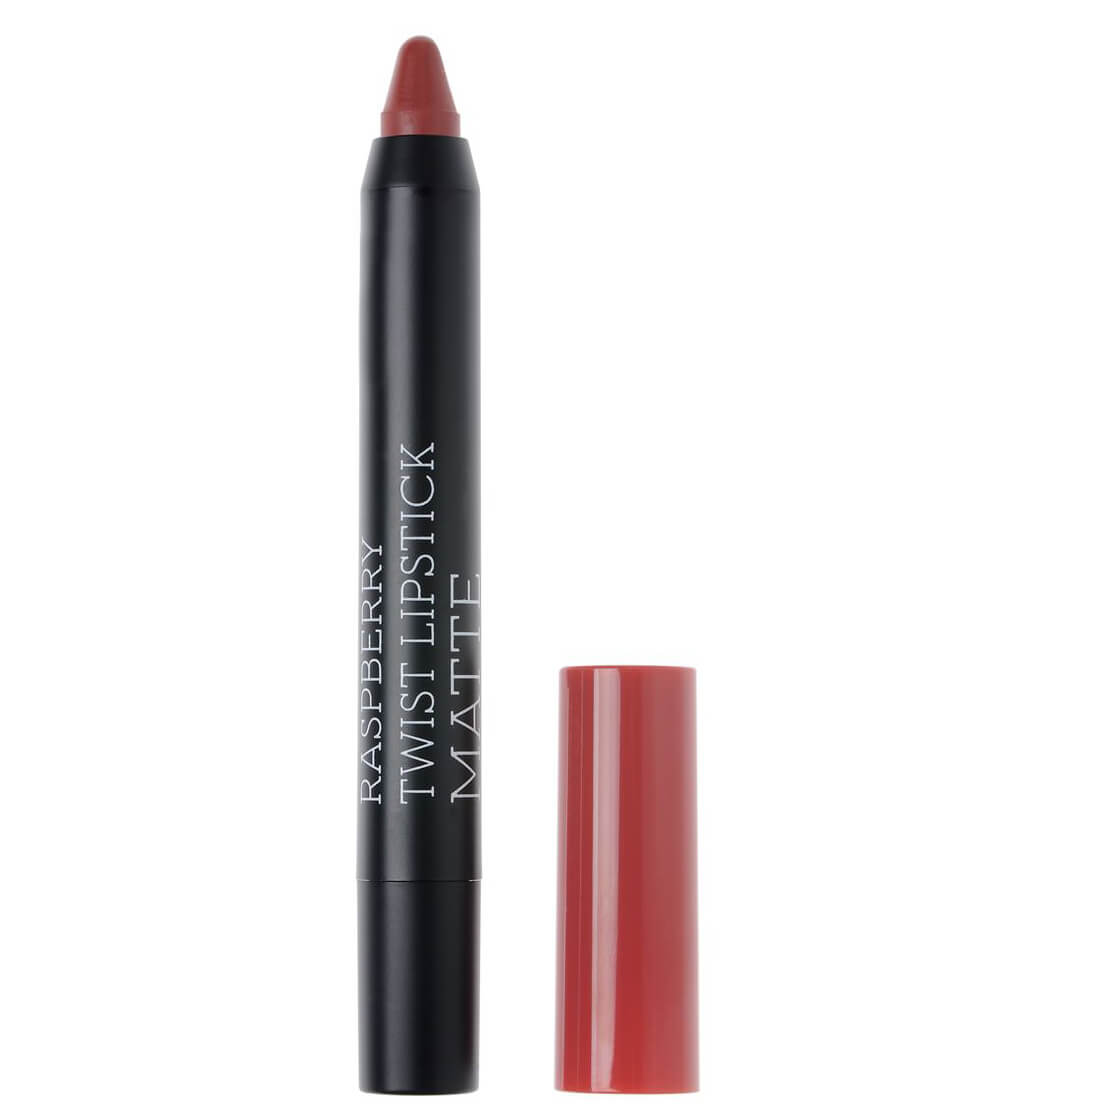 Korres Twist Lipstick Matte, Ultra Mat Αποτέλεσμα, Έντονο Χρώμα, Απόλυτη Άνεση στα Χείλη 1.5gr – Ruby Red